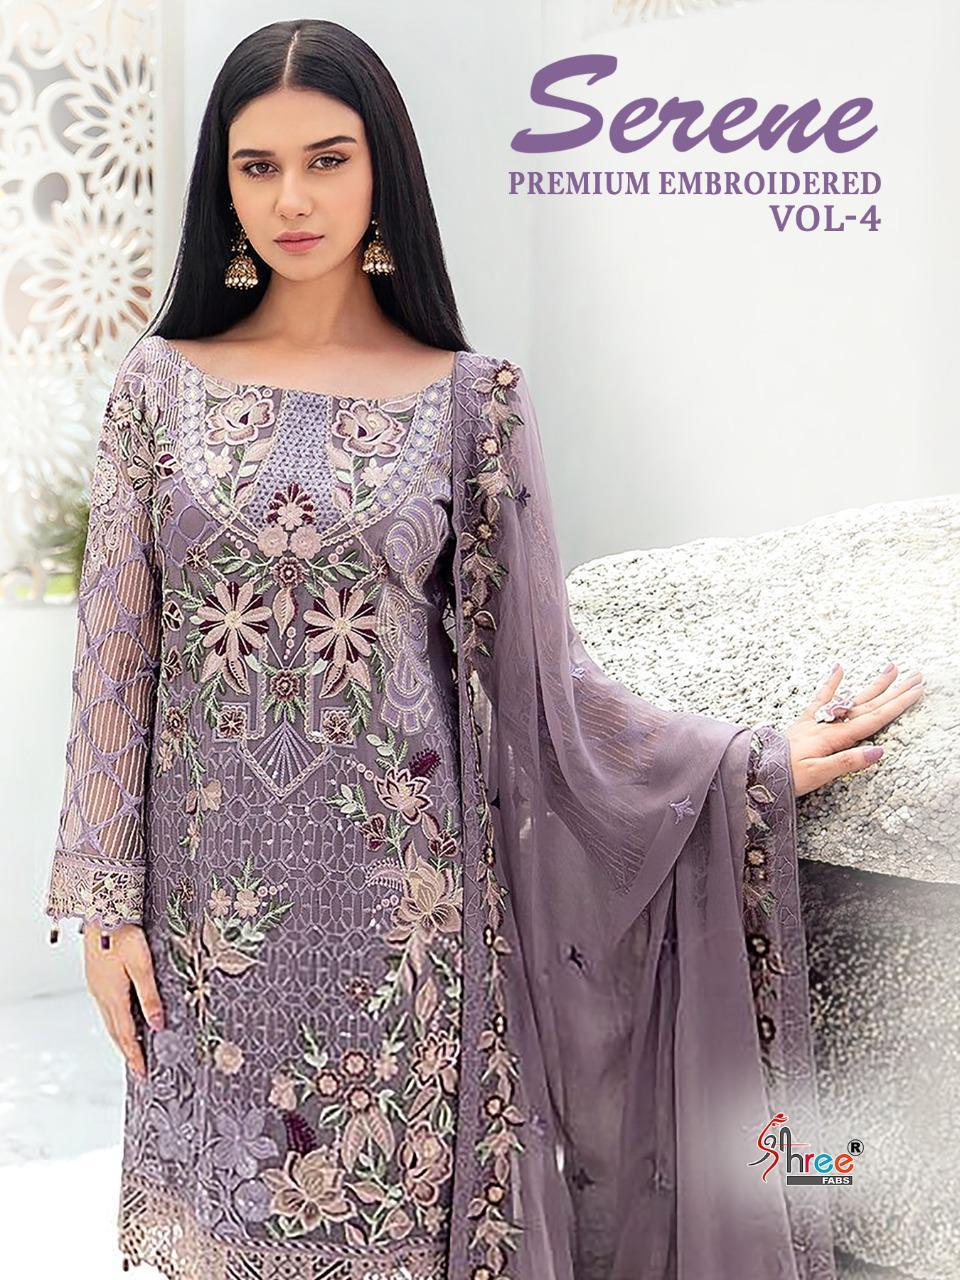 Shree Fabs Serene Premium Embroiderd Vol 4 Salwar Suit Wholesale Catalog 6 Pcs 4 - Shree Fabs Serene Premium Embroiderd Vol 4 Salwar Suit Wholesale Catalog 6 Pcs